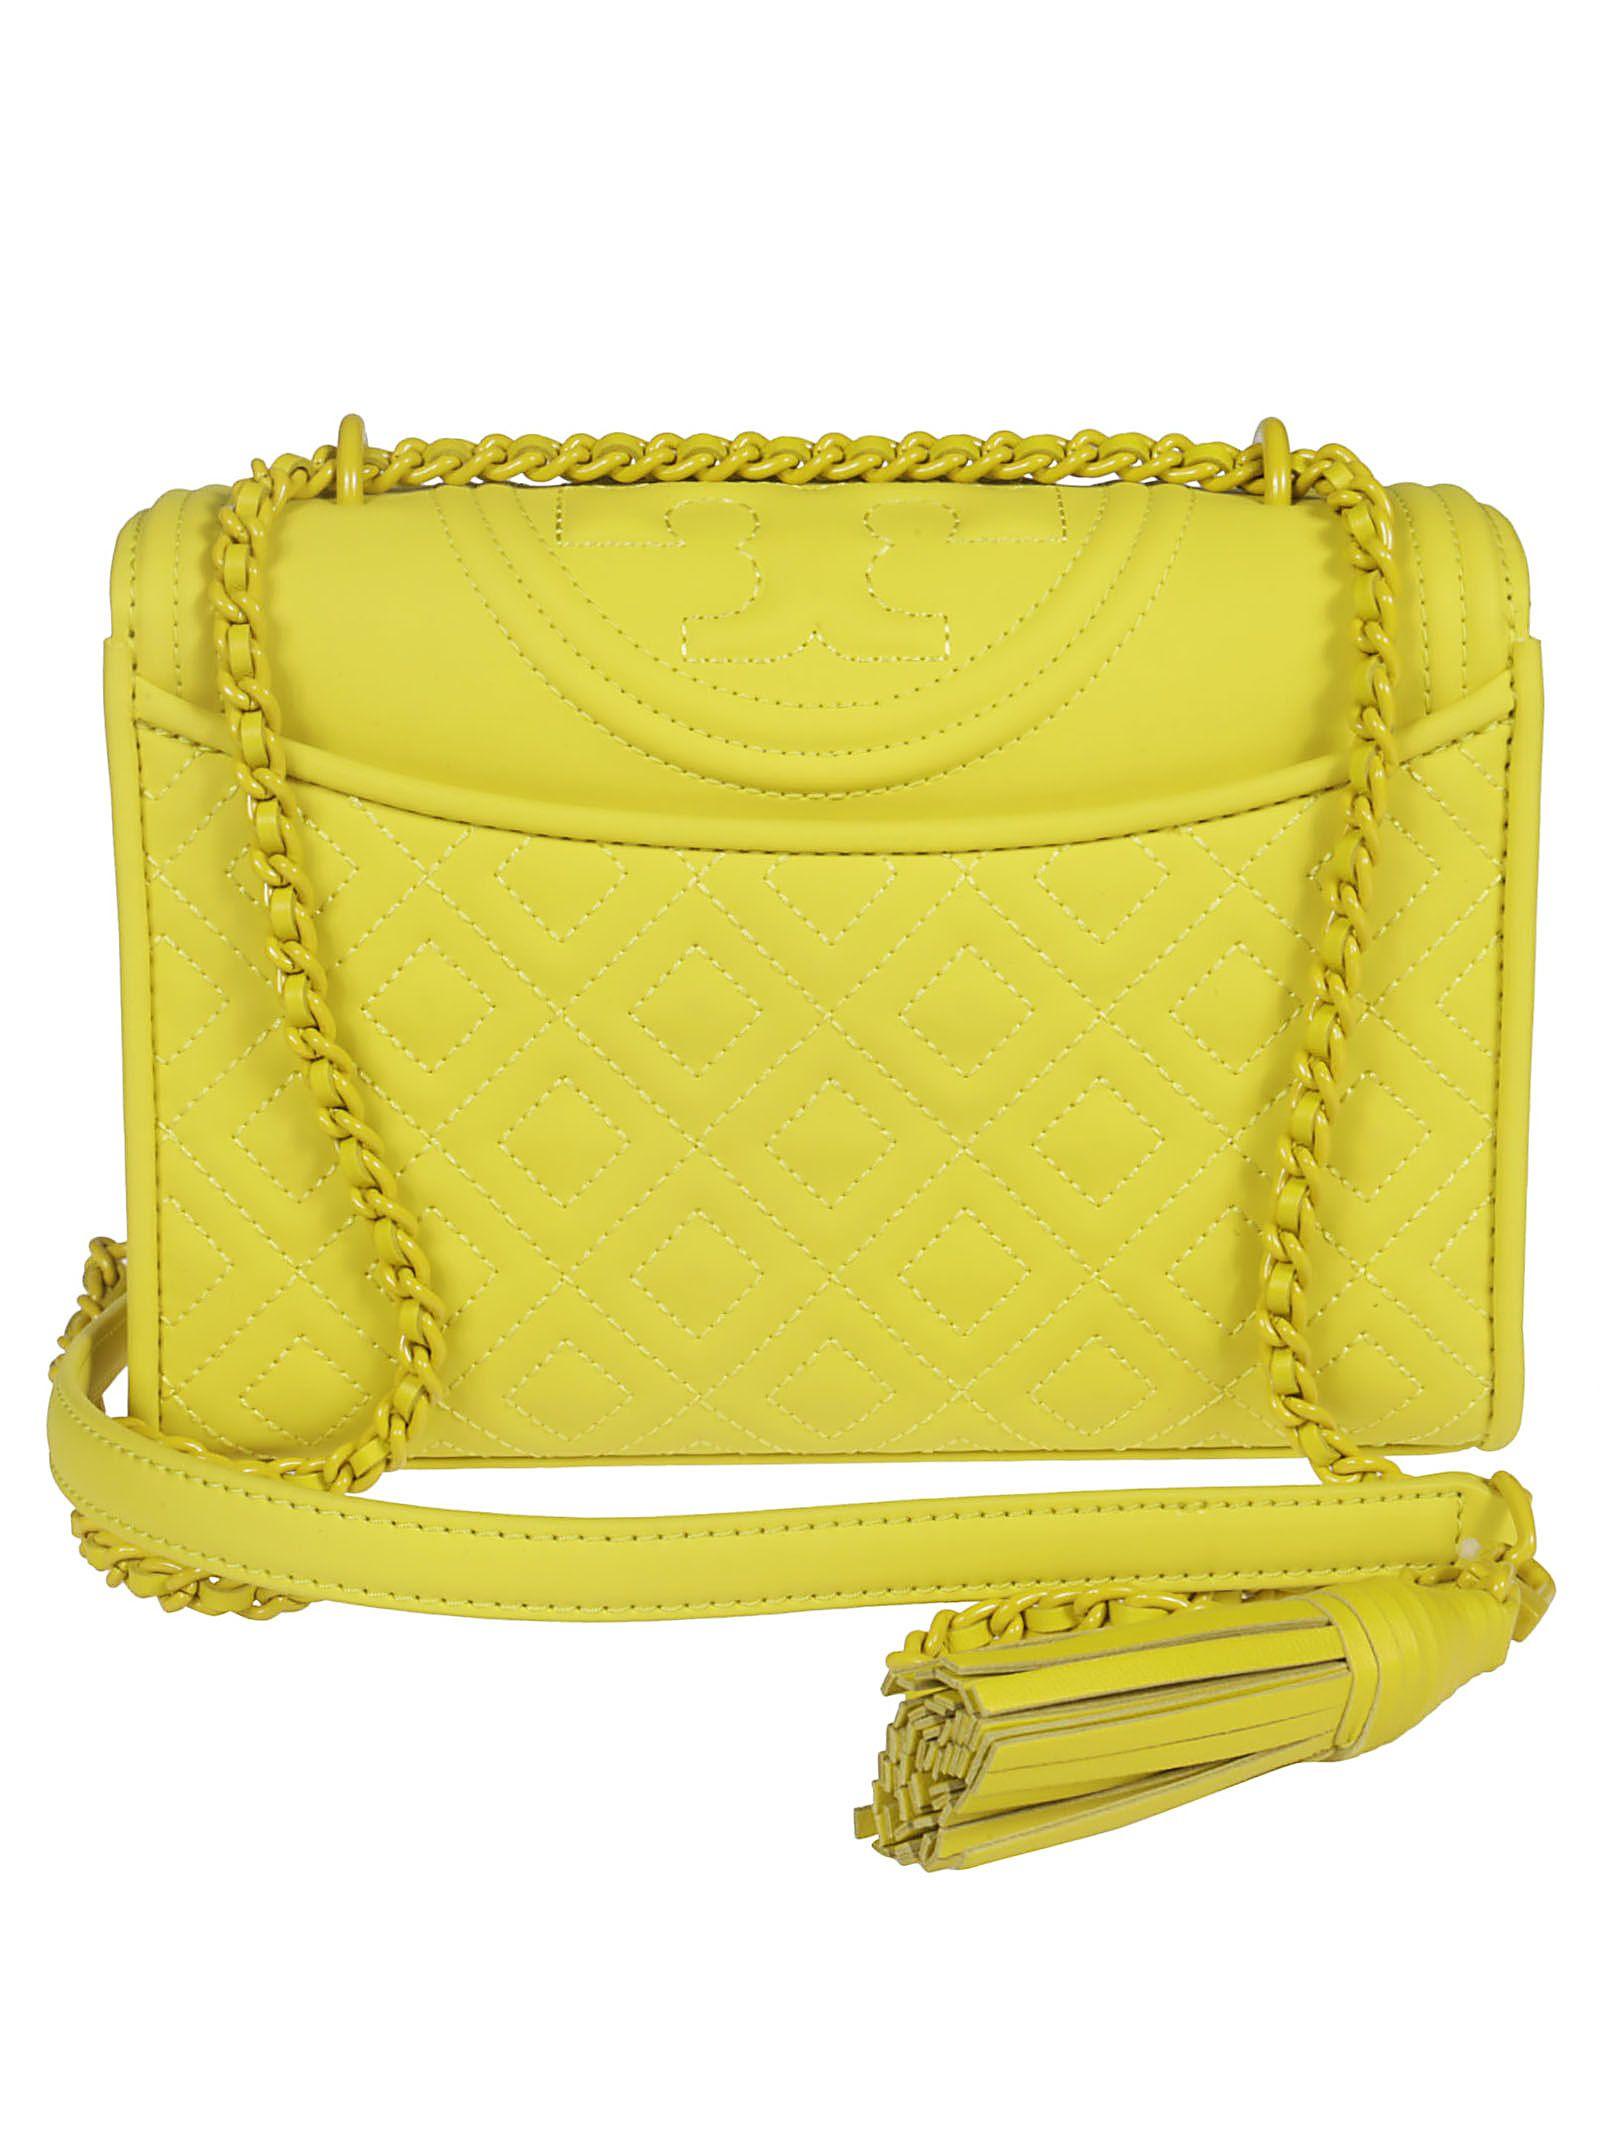 749240ce3e Tory Burch Tory Burch Fleming Embossed Logo Shoulder Bag - yellow ...